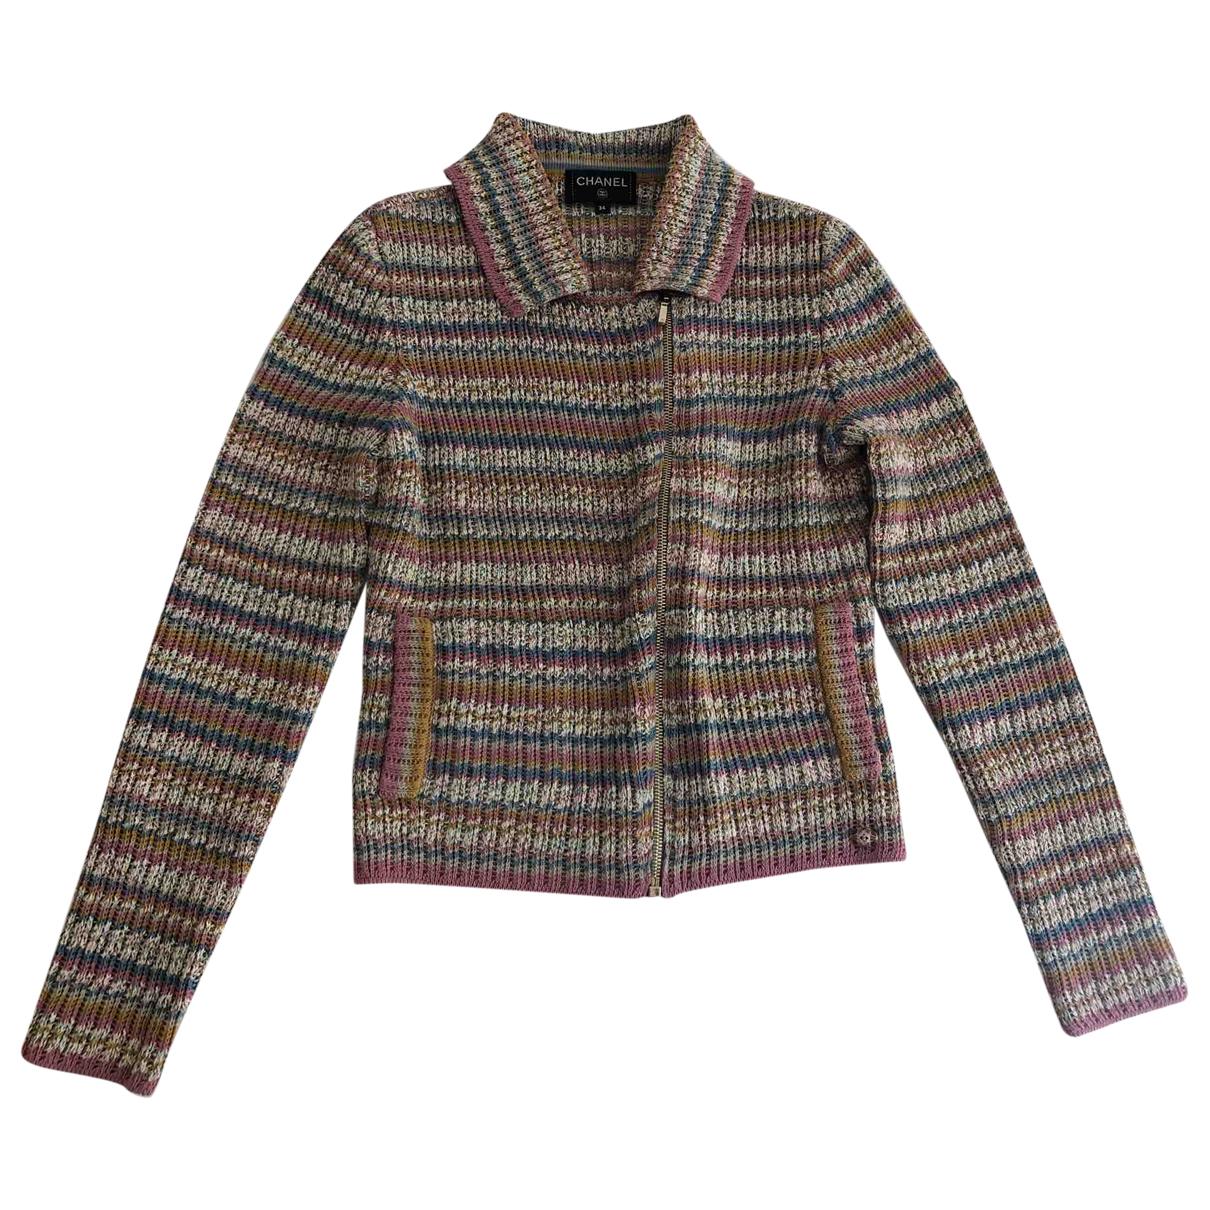 Chanel \N Multicolour Cotton jacket for Women 34 FR